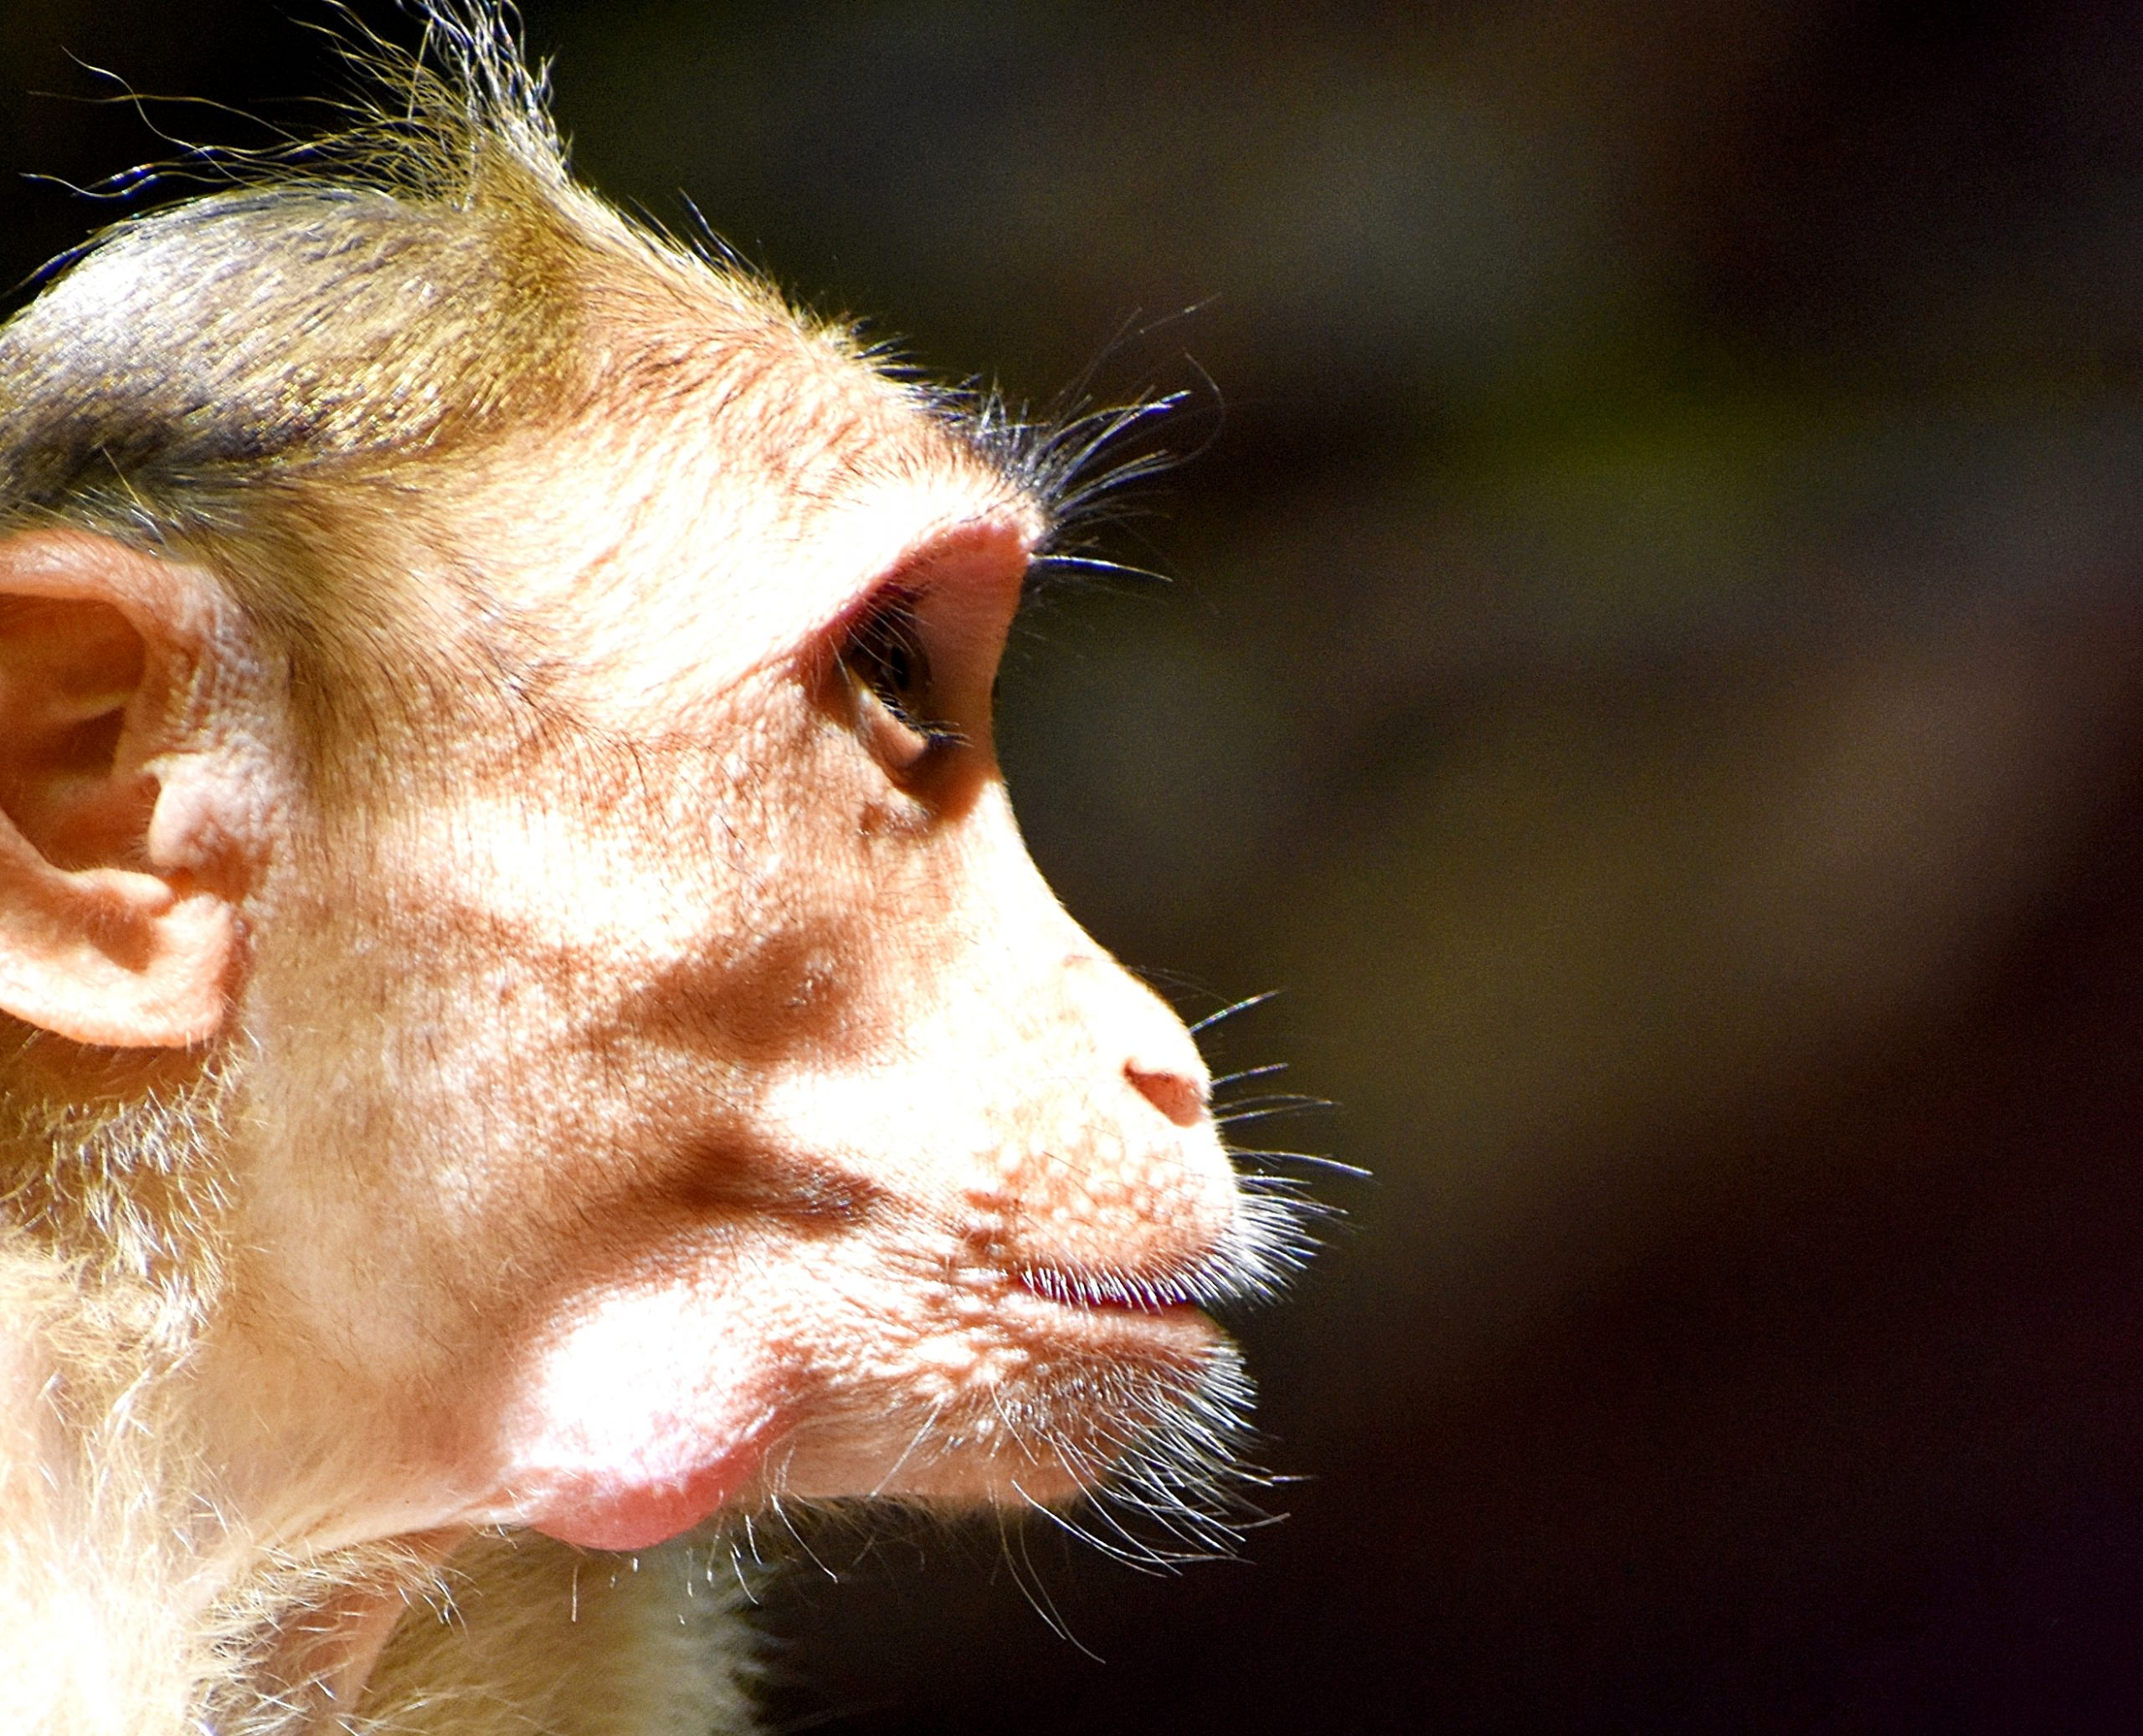 Face of a monkey